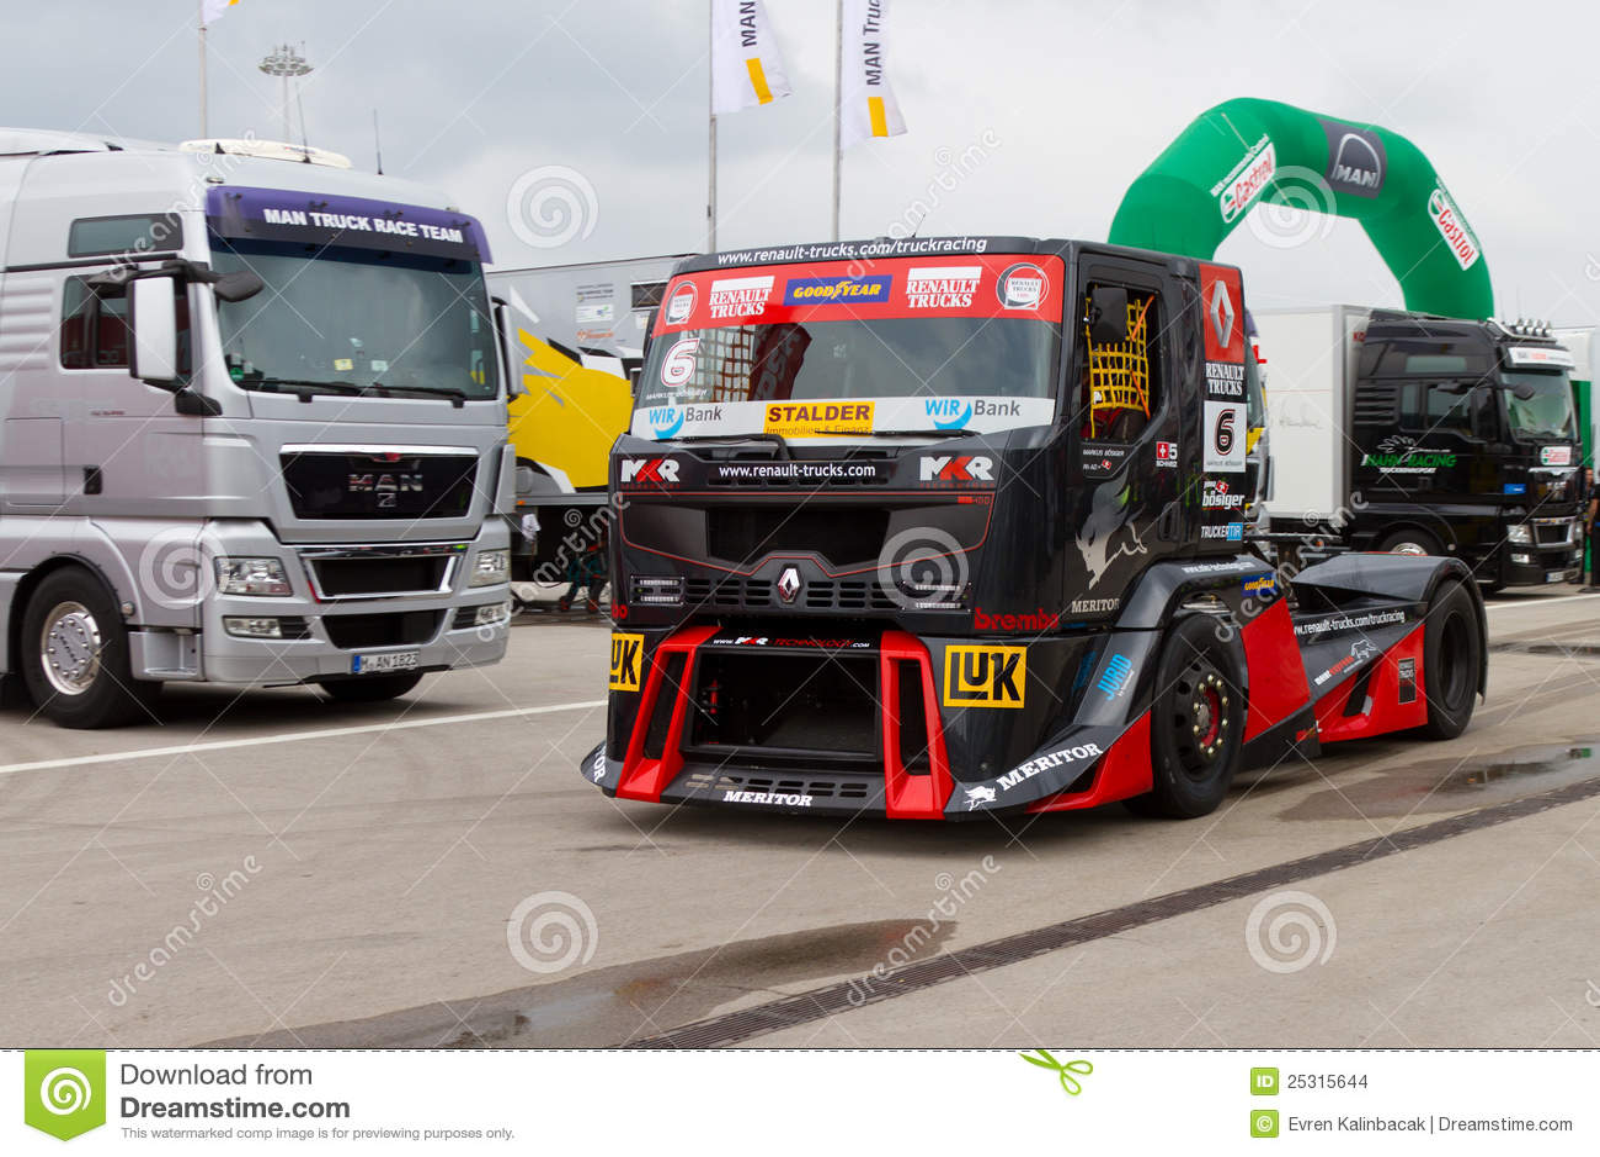 2012 fia european truck racing championship editorial for Credit garage renault